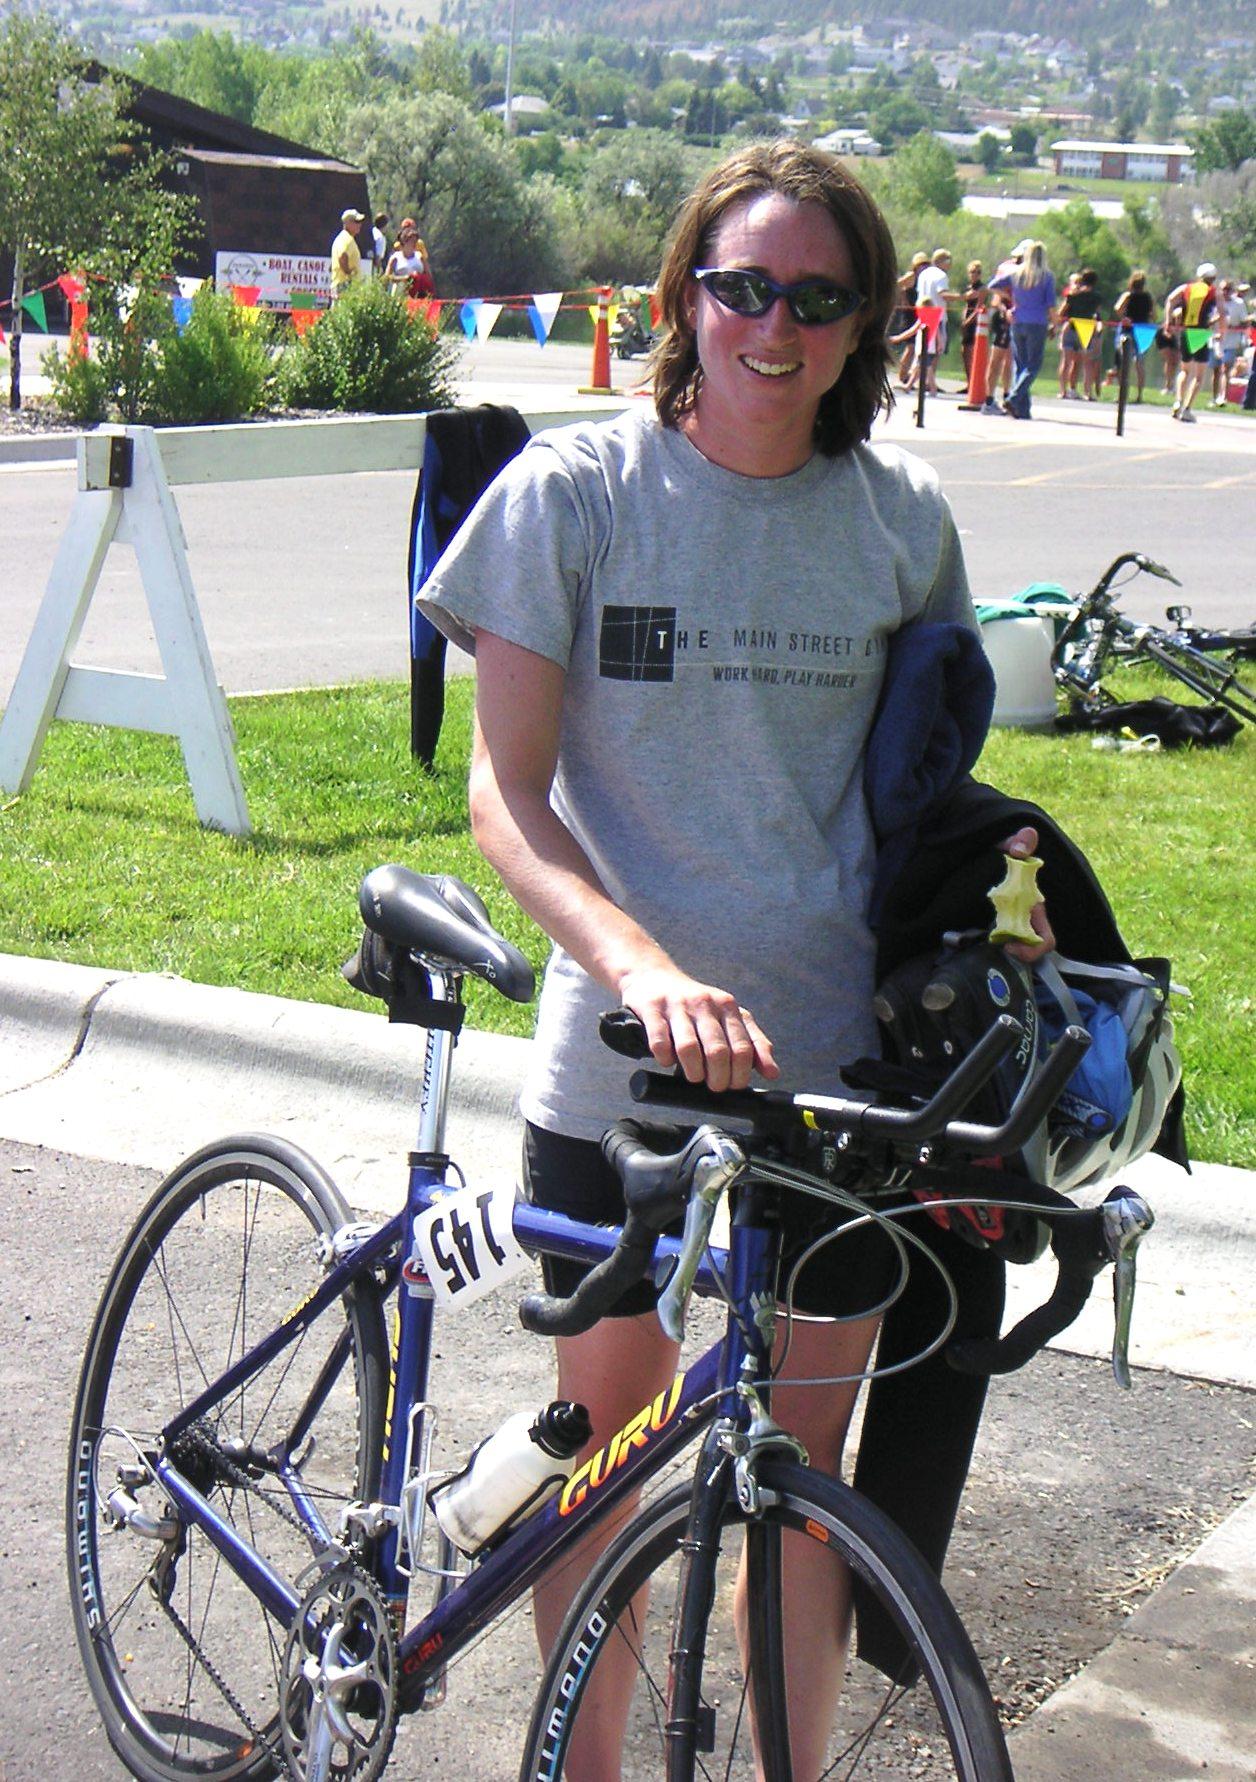 Triton Mandy Axelson at 2009 Spring Meadow Triathlon